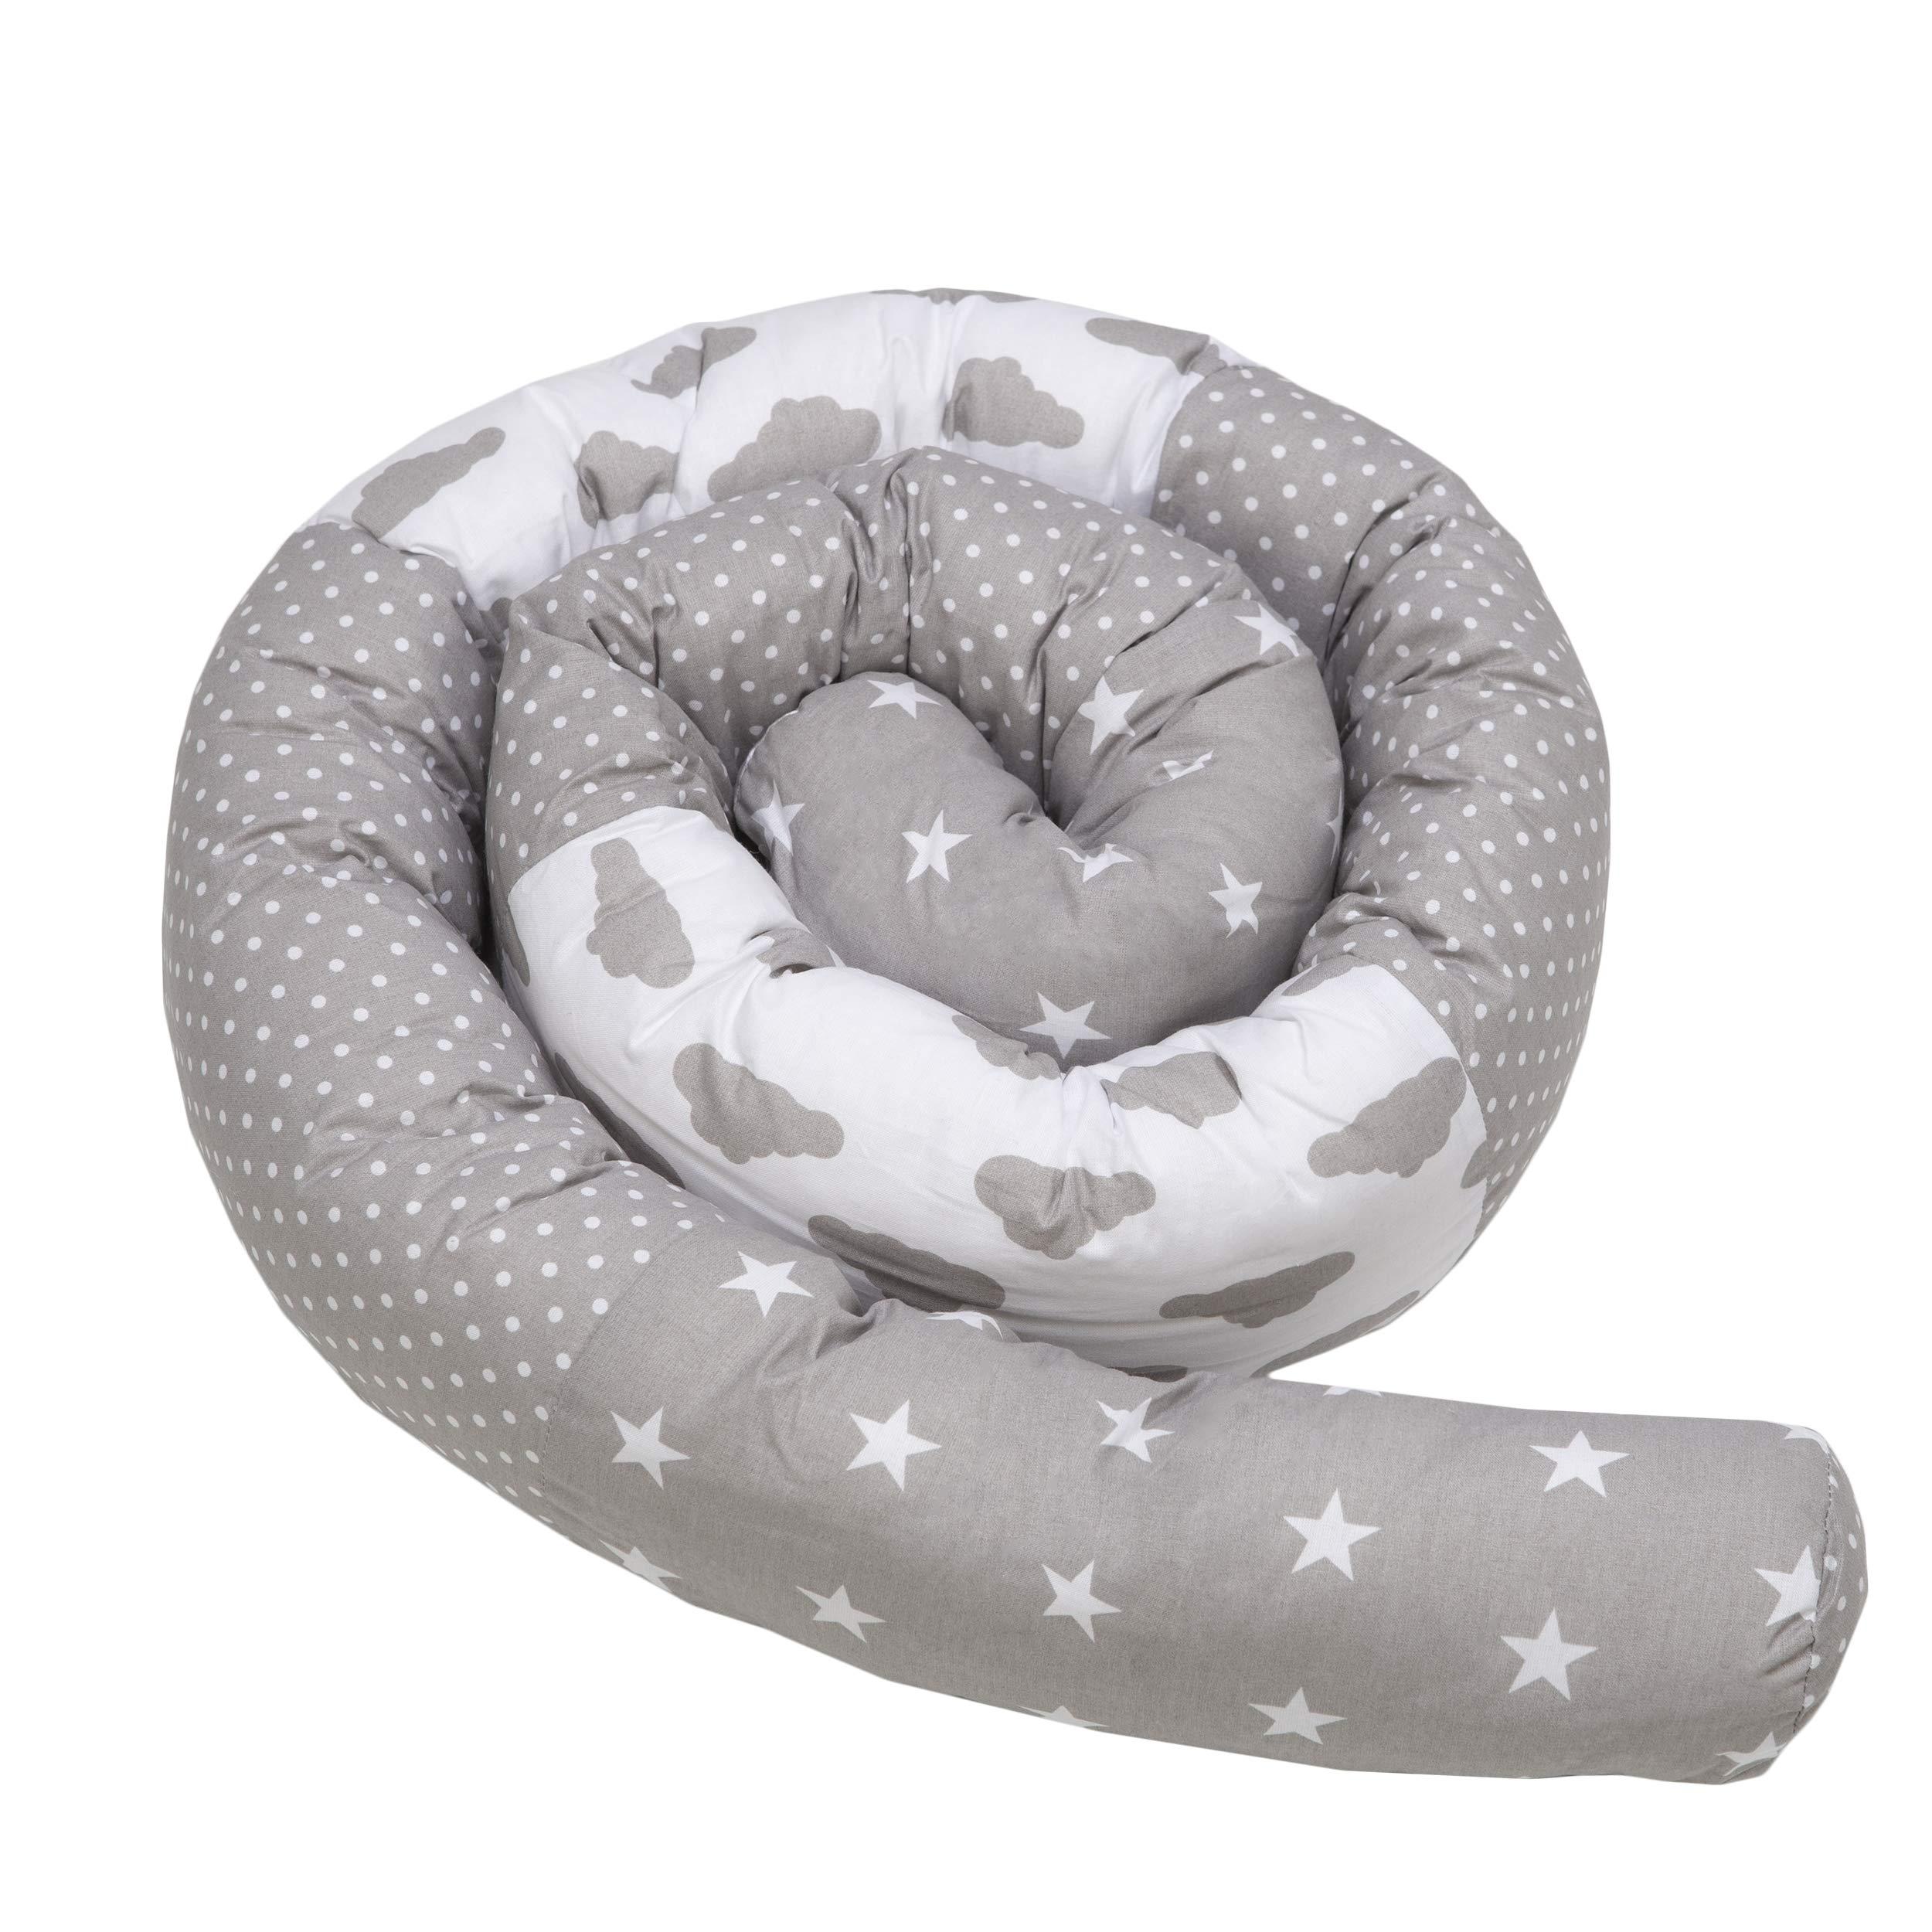 Cojín para Cuna 210cm Bebé Parachoques Rollo Antialérgico Algodón Vivero Serpiente Lumbar Nido Protector Rollo de